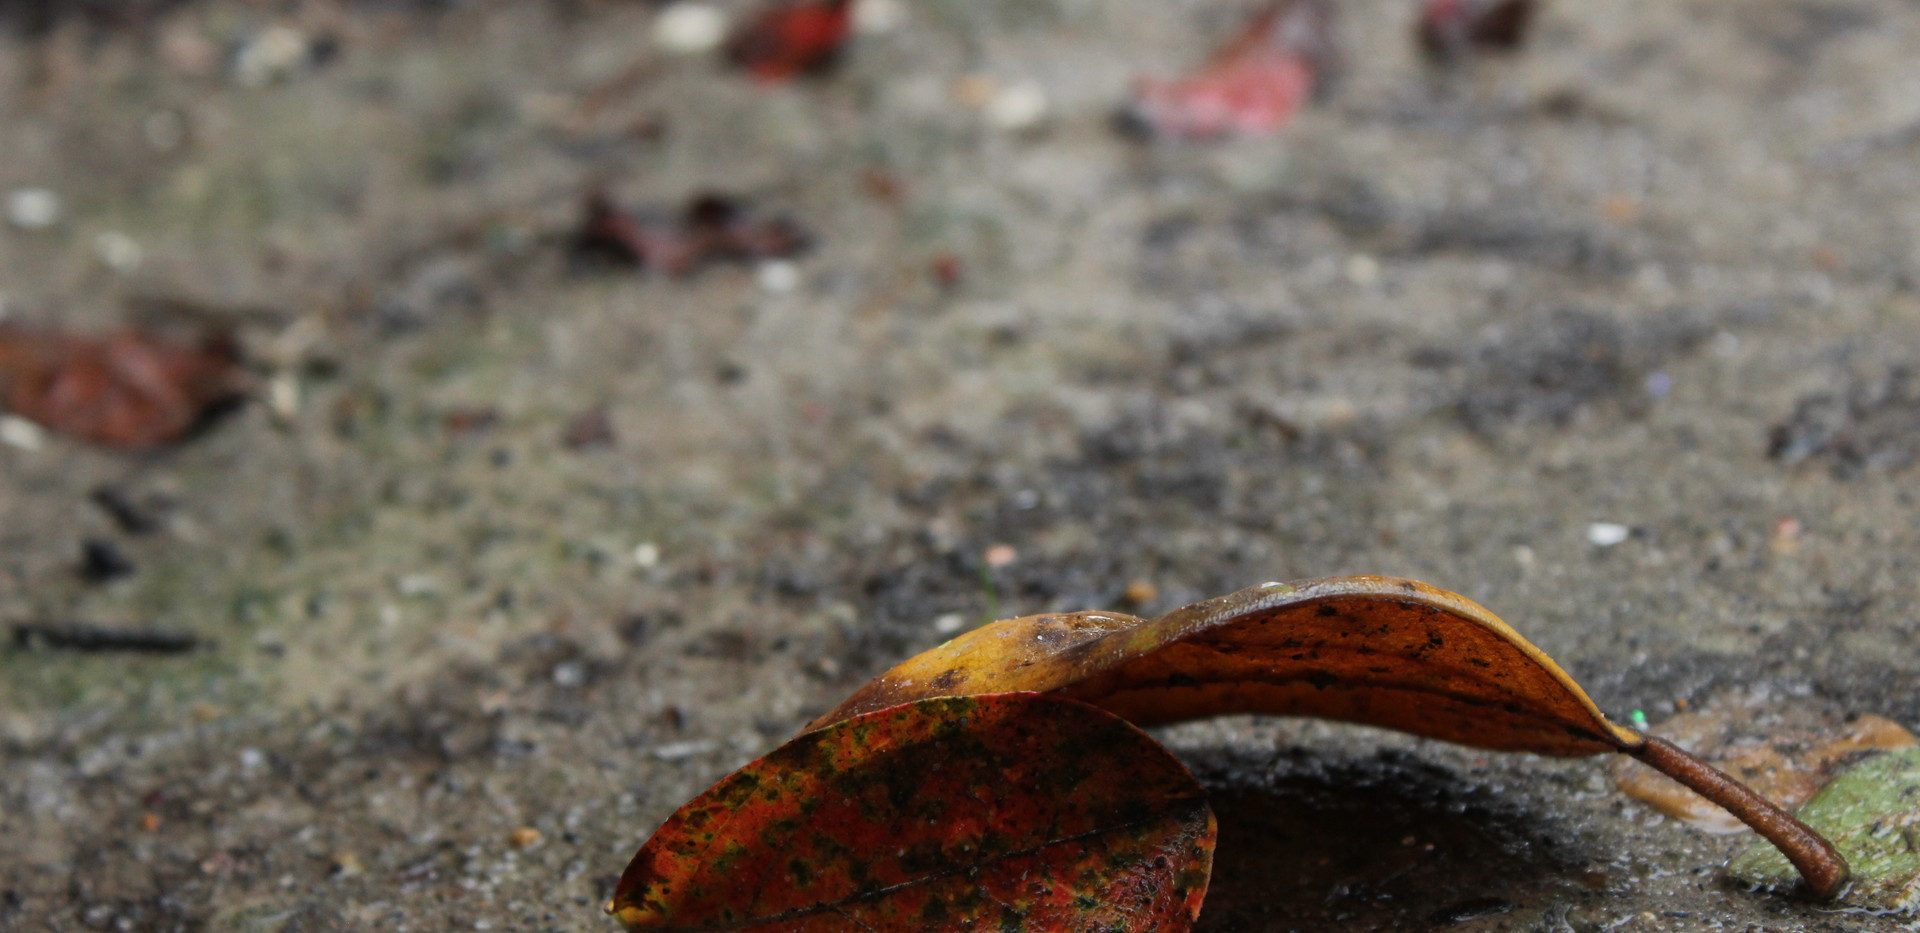 libbie wabi sabi dying leaf on the GROUN